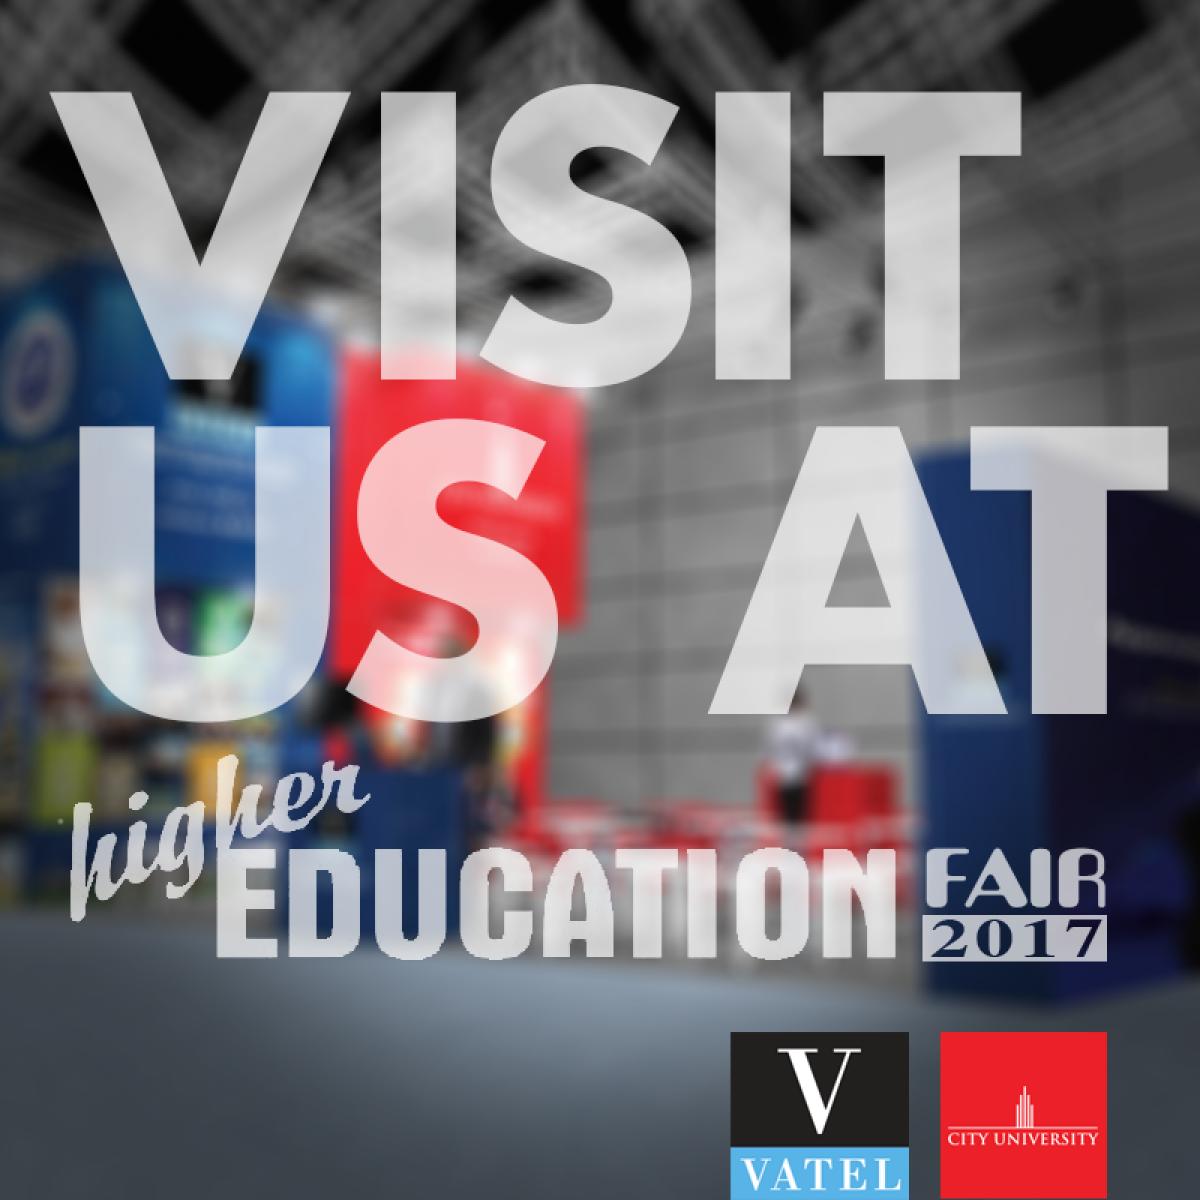 Vatel Kuala Lumpur - VATEL Kuala Lumpur Event - 1